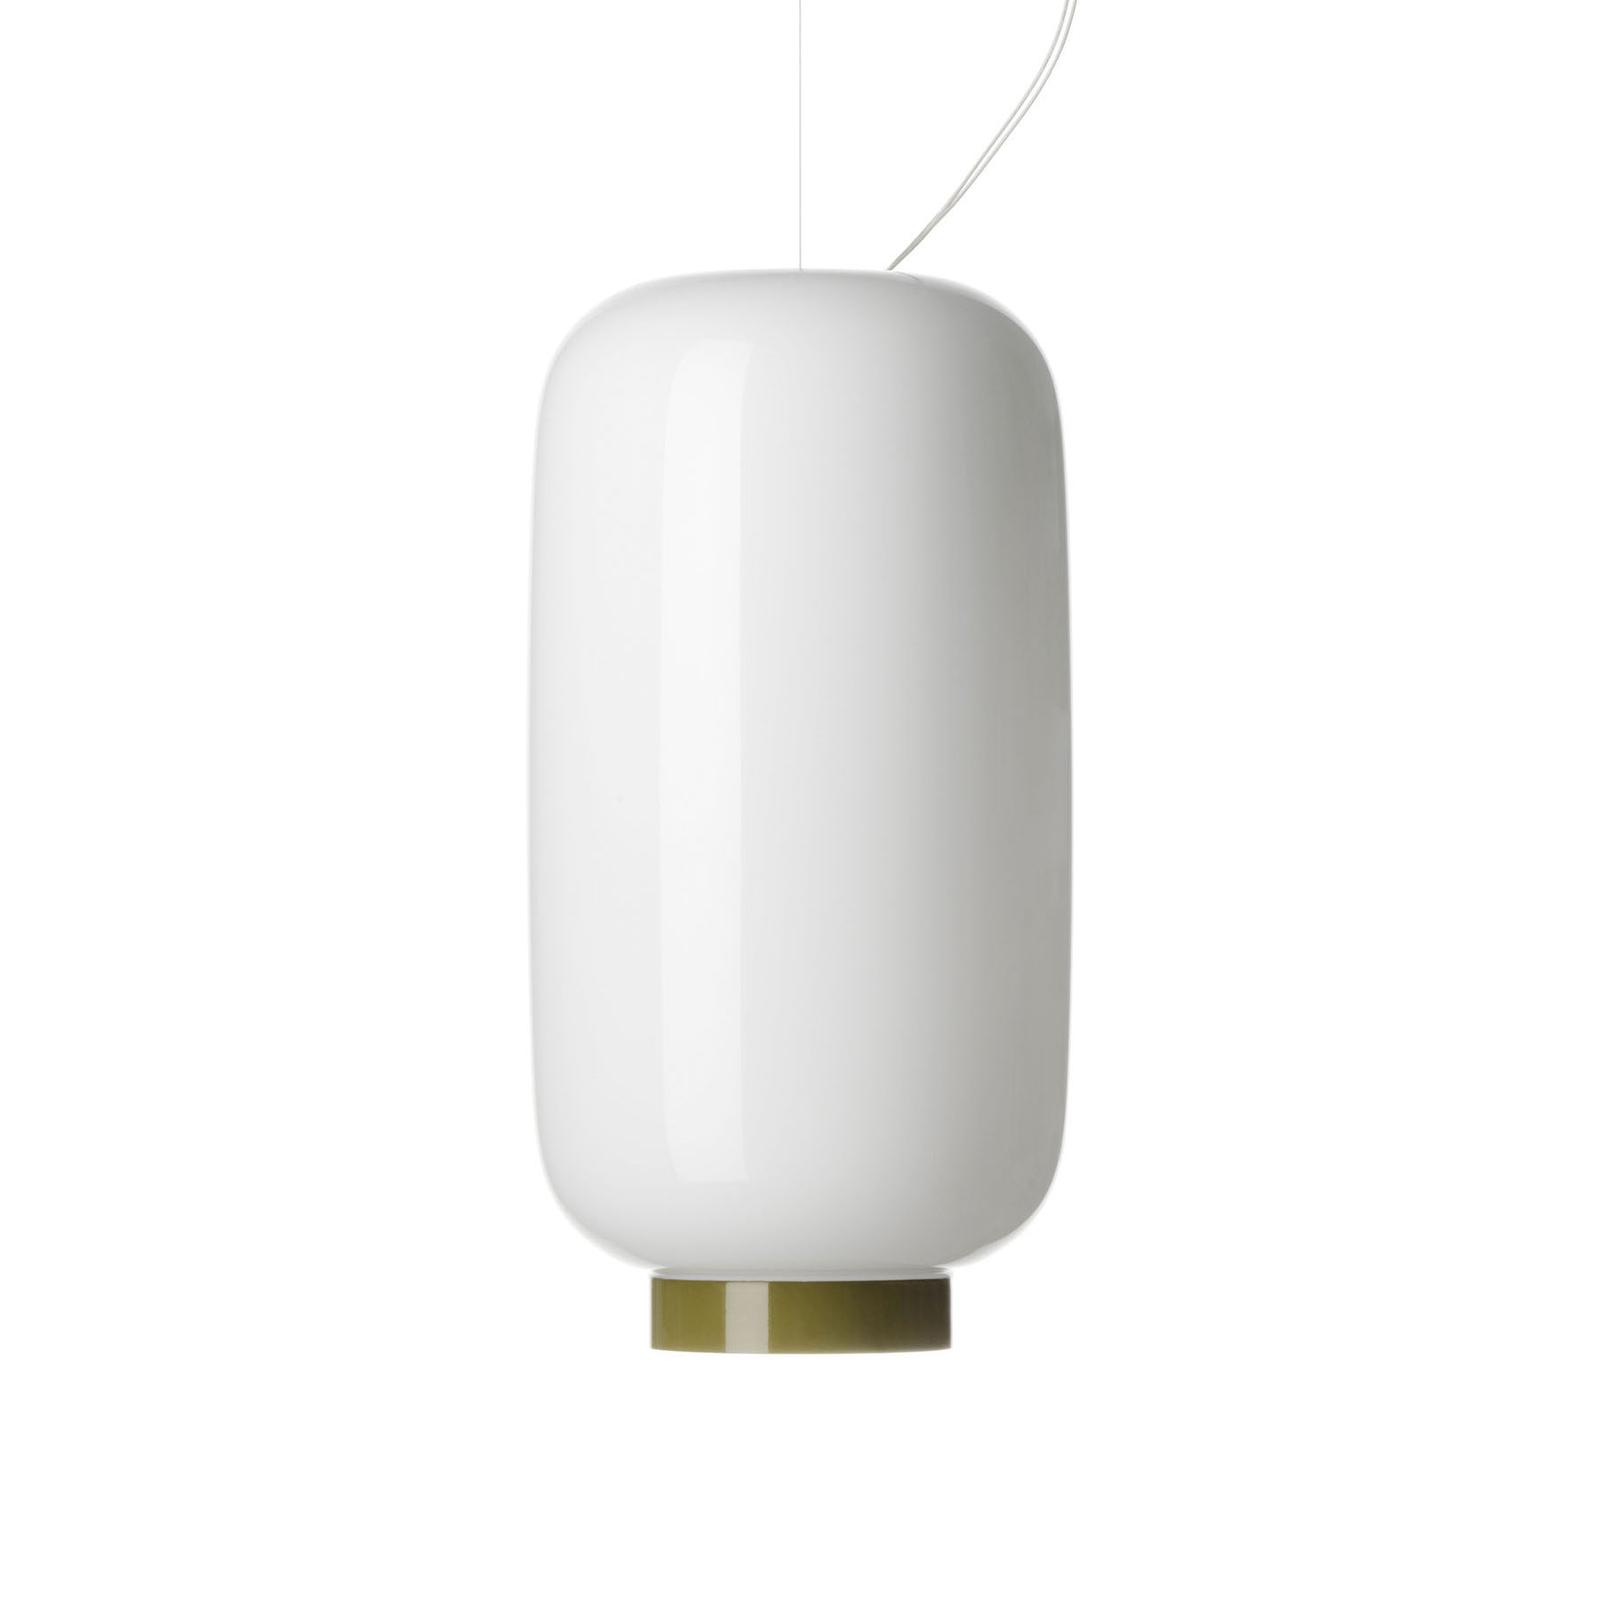 Foscarini MyLight Chouchin Reverse 2 hængelampe